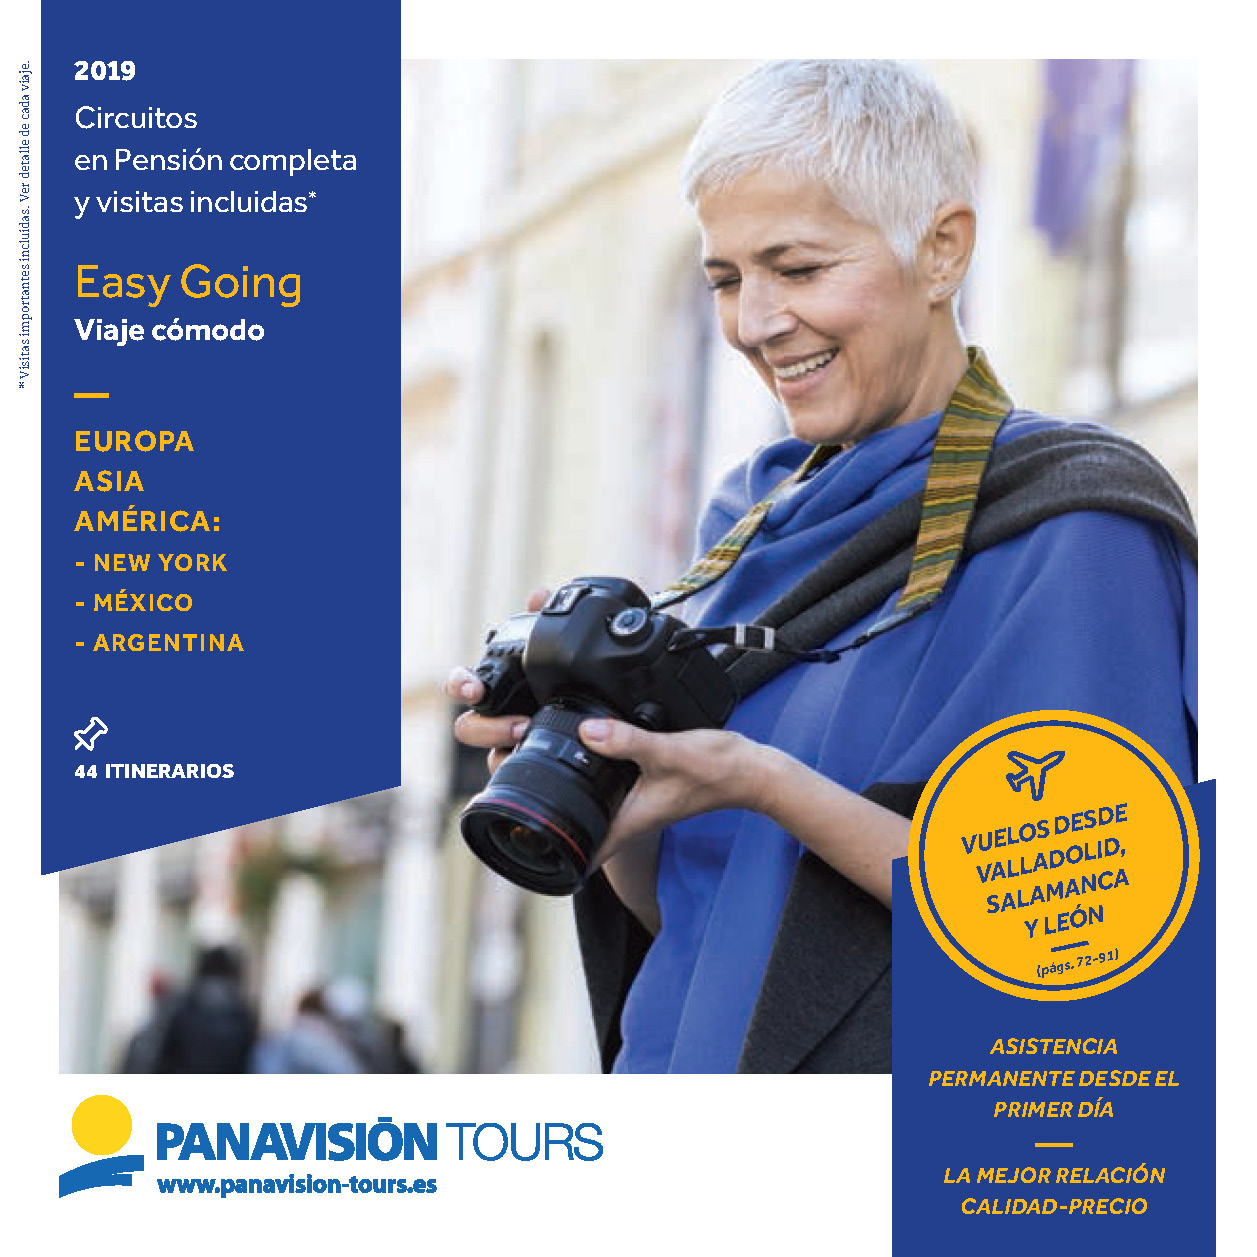 Catalogo Panavision Tours Easy Going 2019 salidas Castilla y Leon EC9